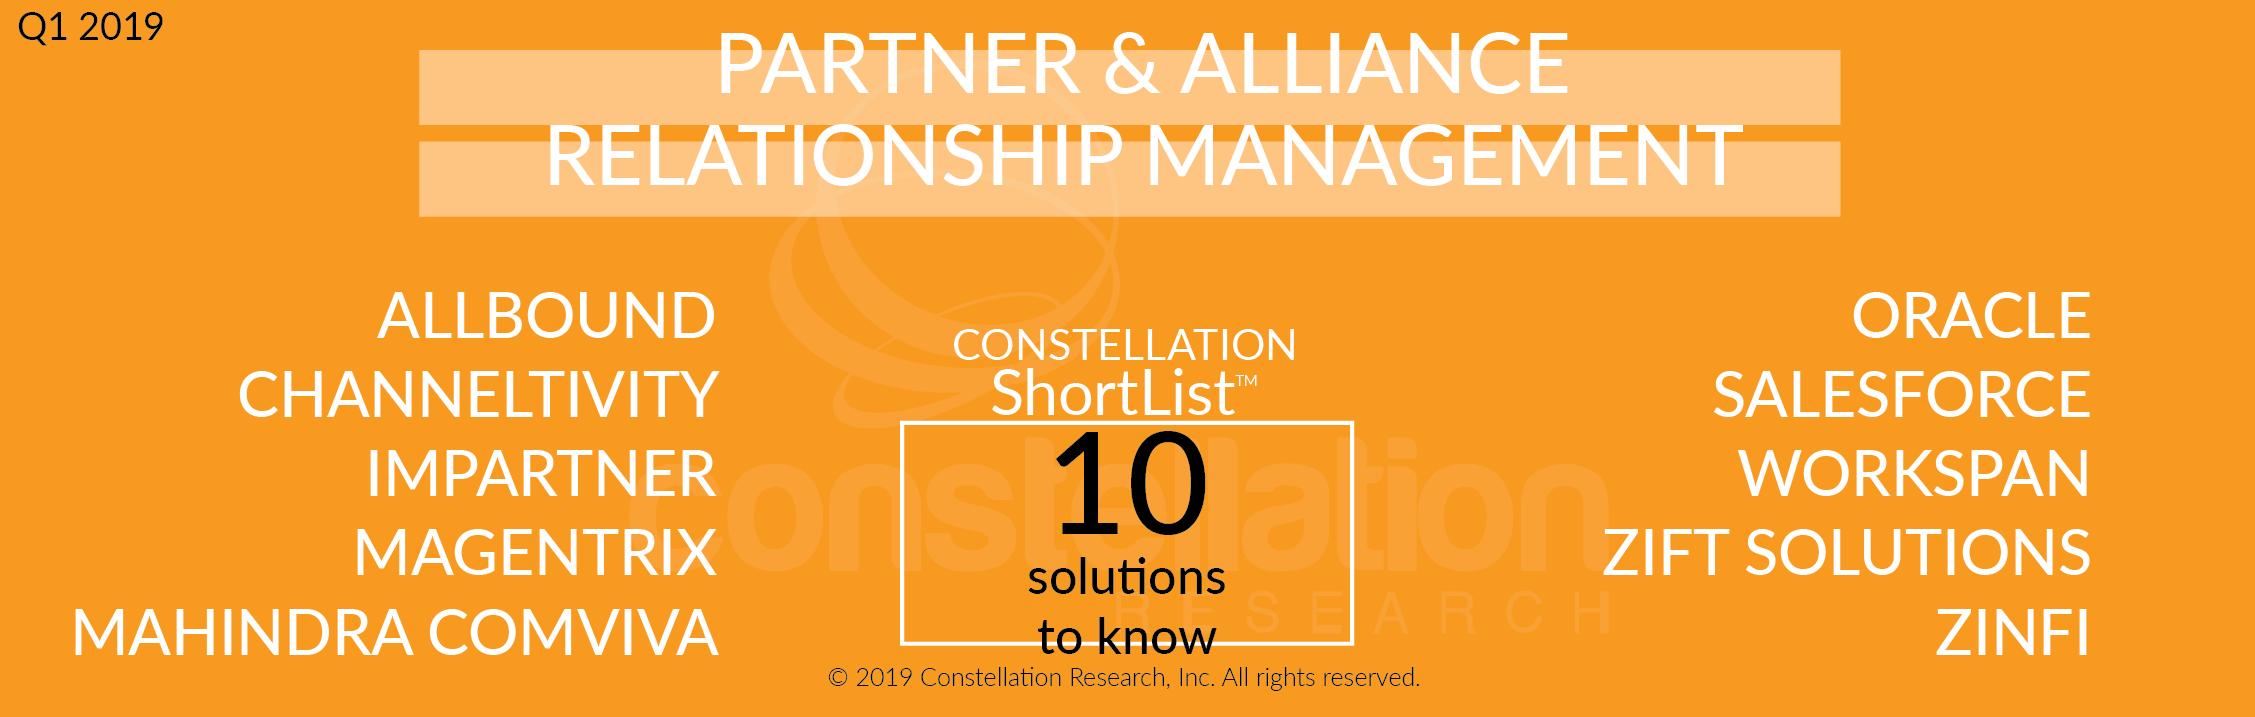 Partner in a relationship